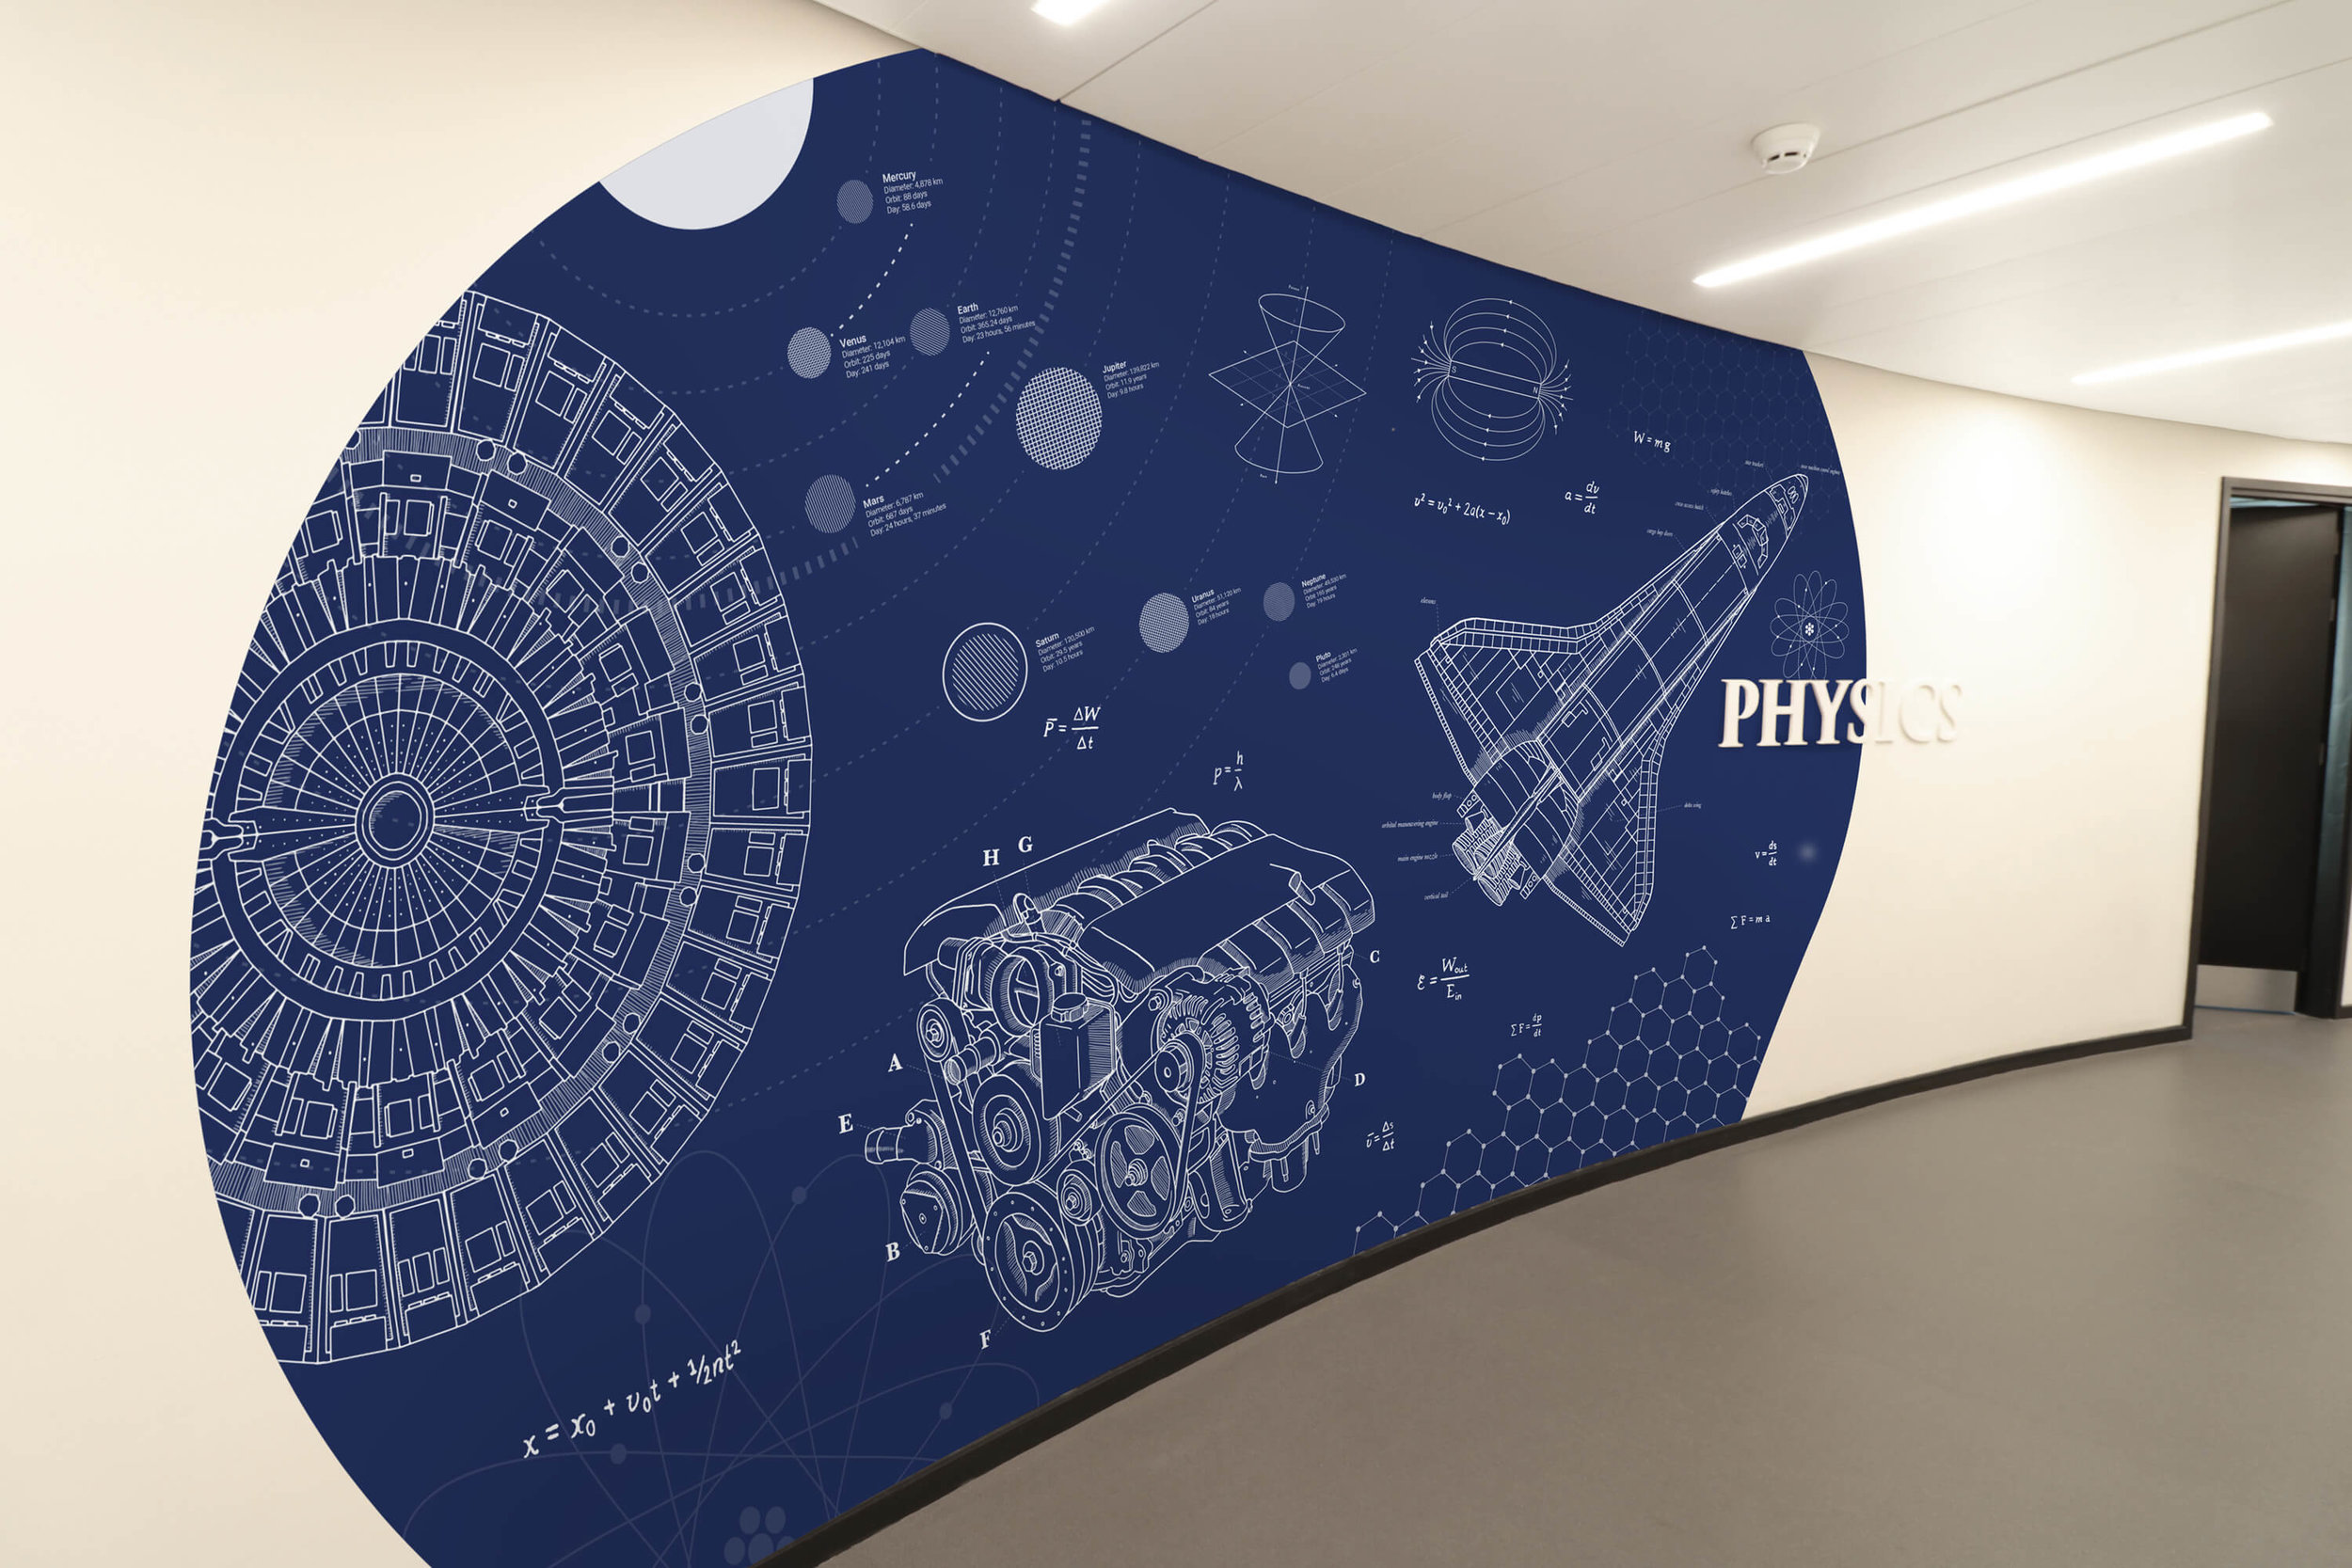 dld_college_london_blueprint_wonderwall_physics.jpg